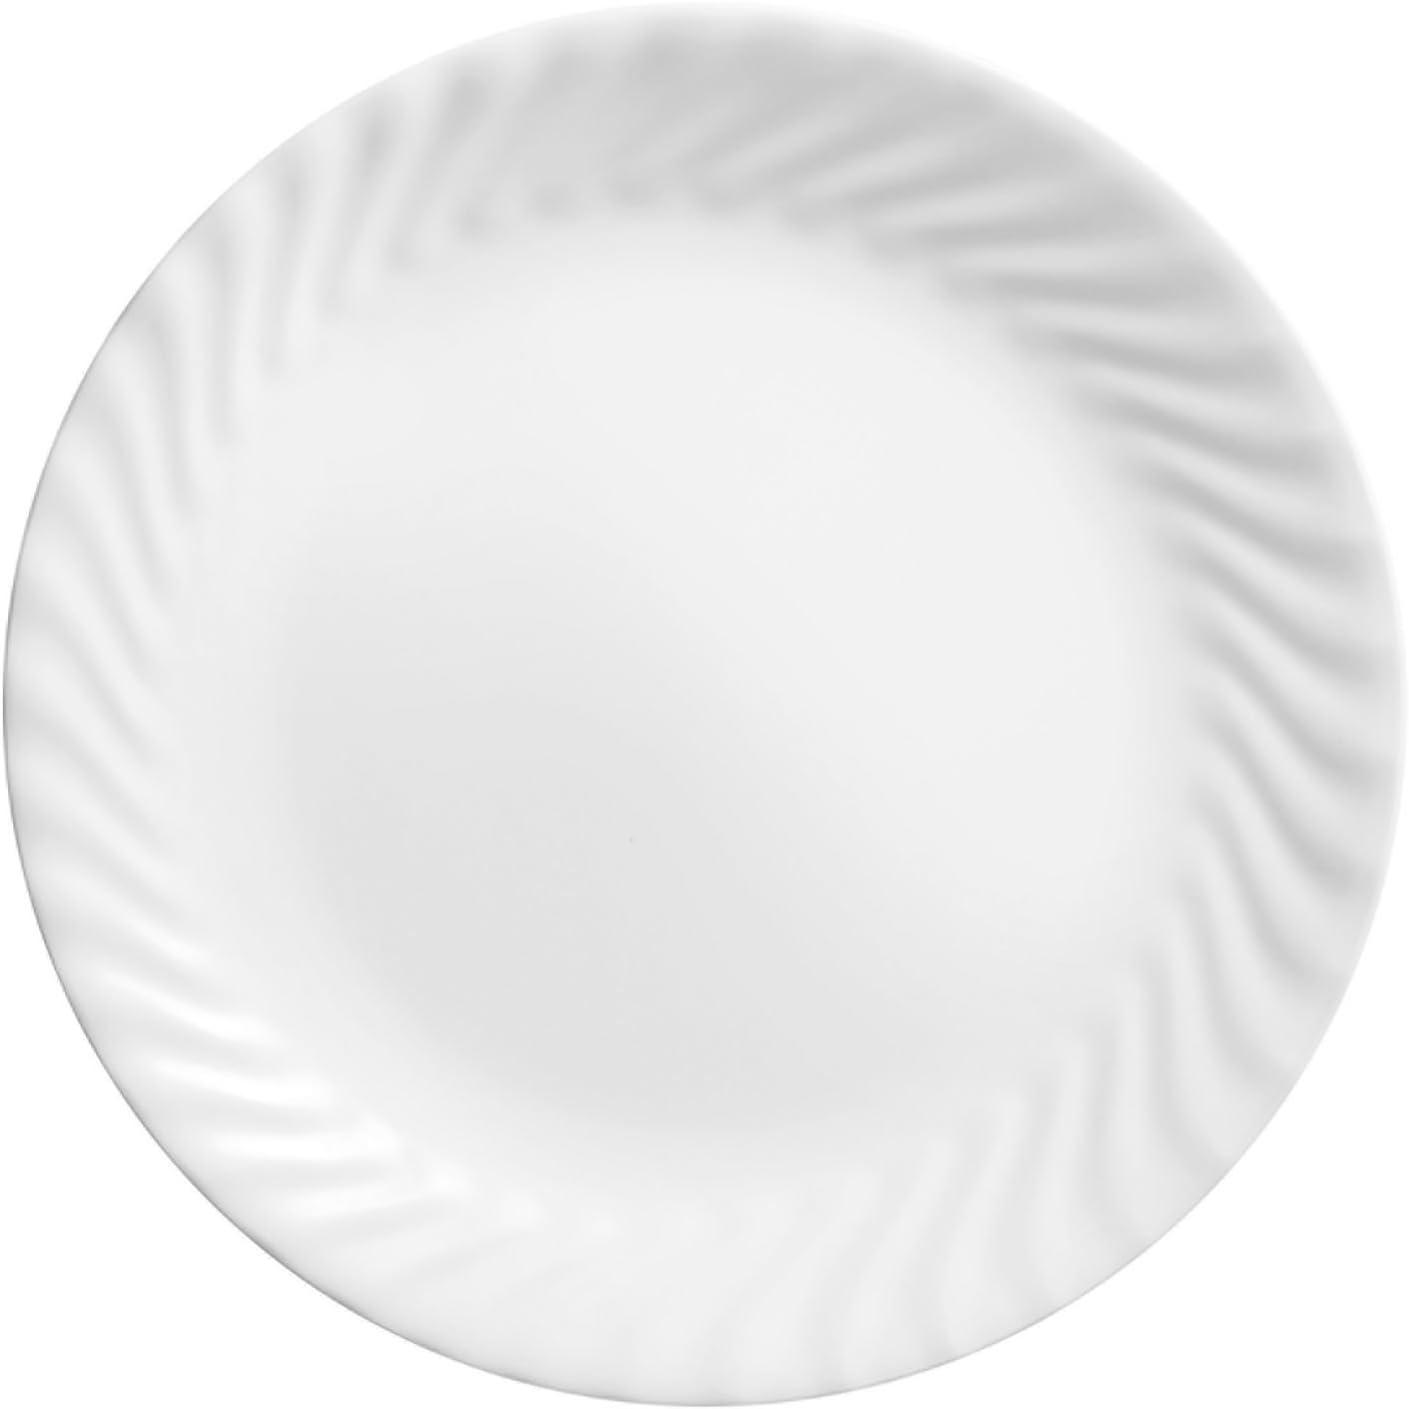 Corelle 8.5 Inch Luncheon Plate BP Enhancements